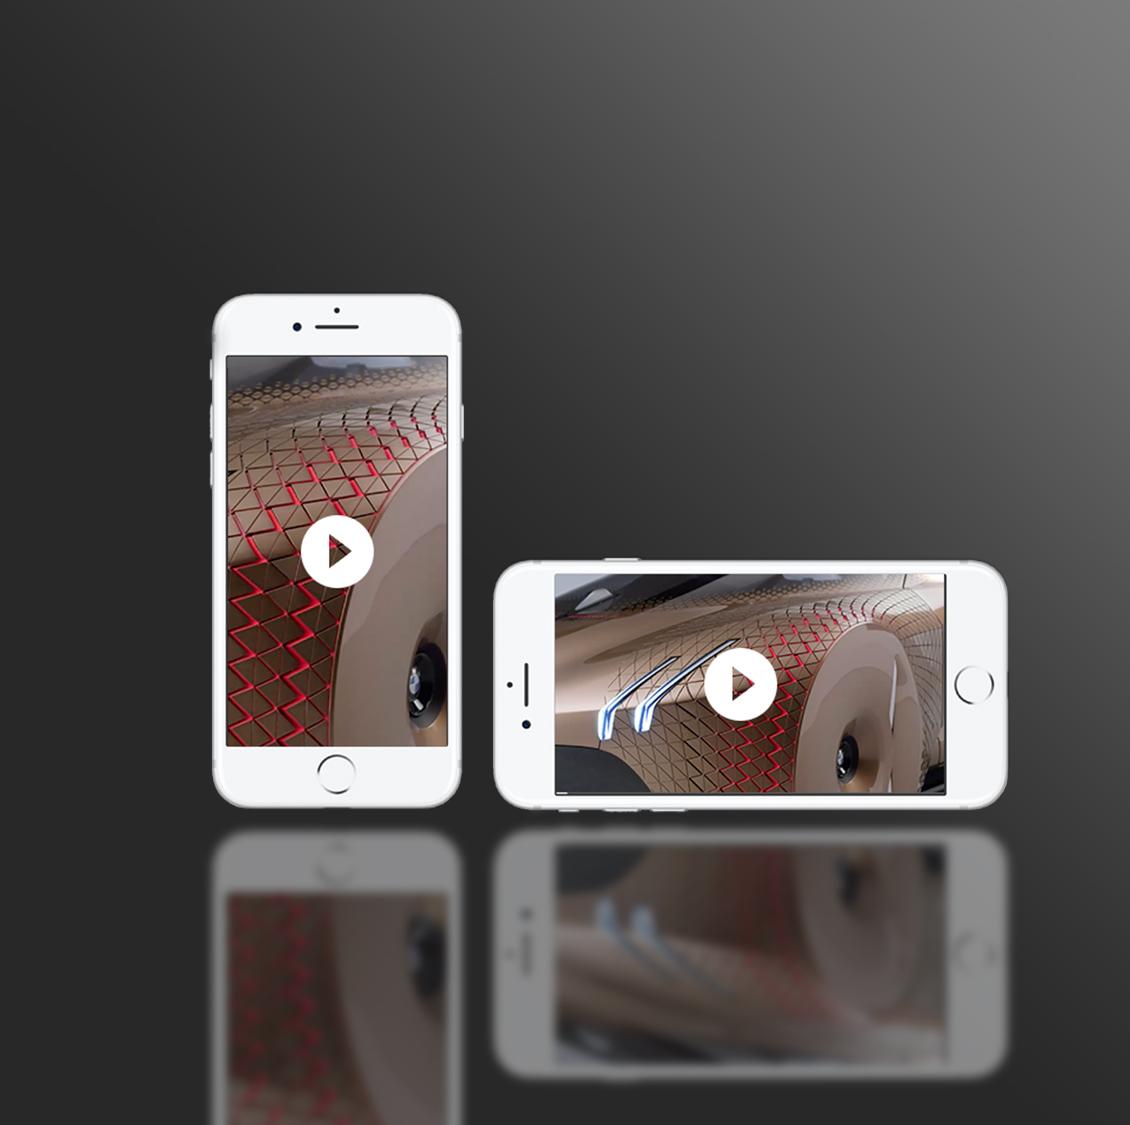 Horizontale vs vertikale Videos